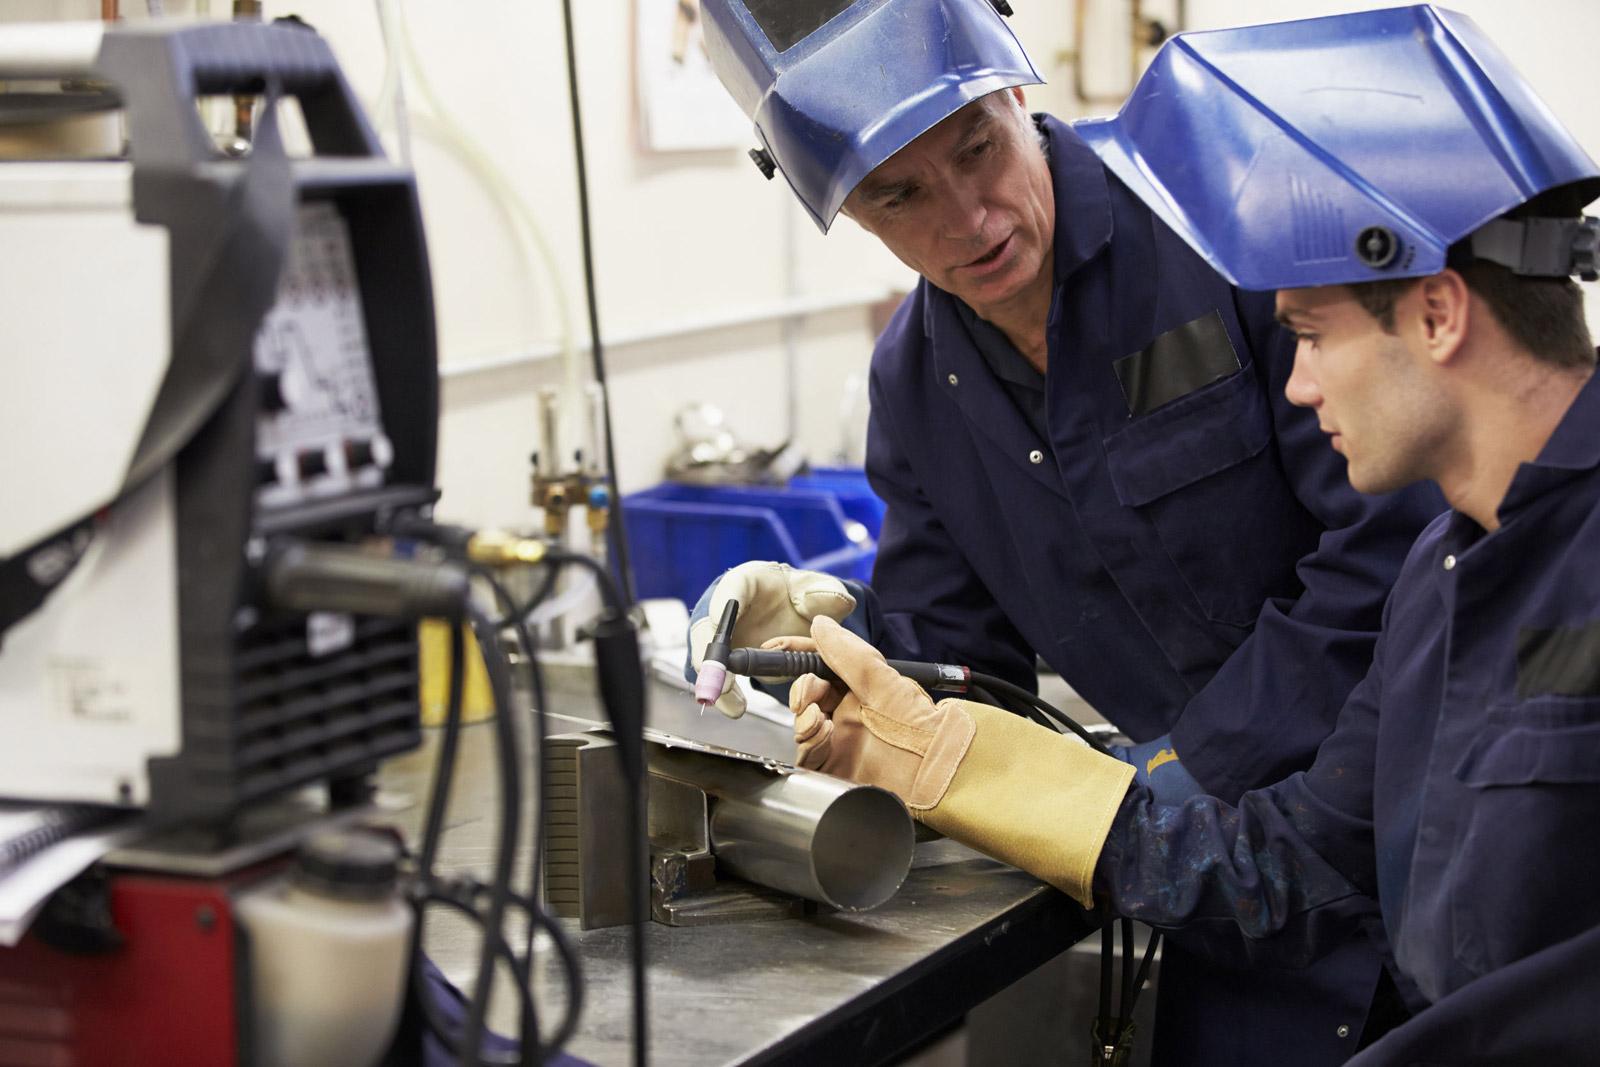 Weld Procedure Certification and Welder Qualification Testing